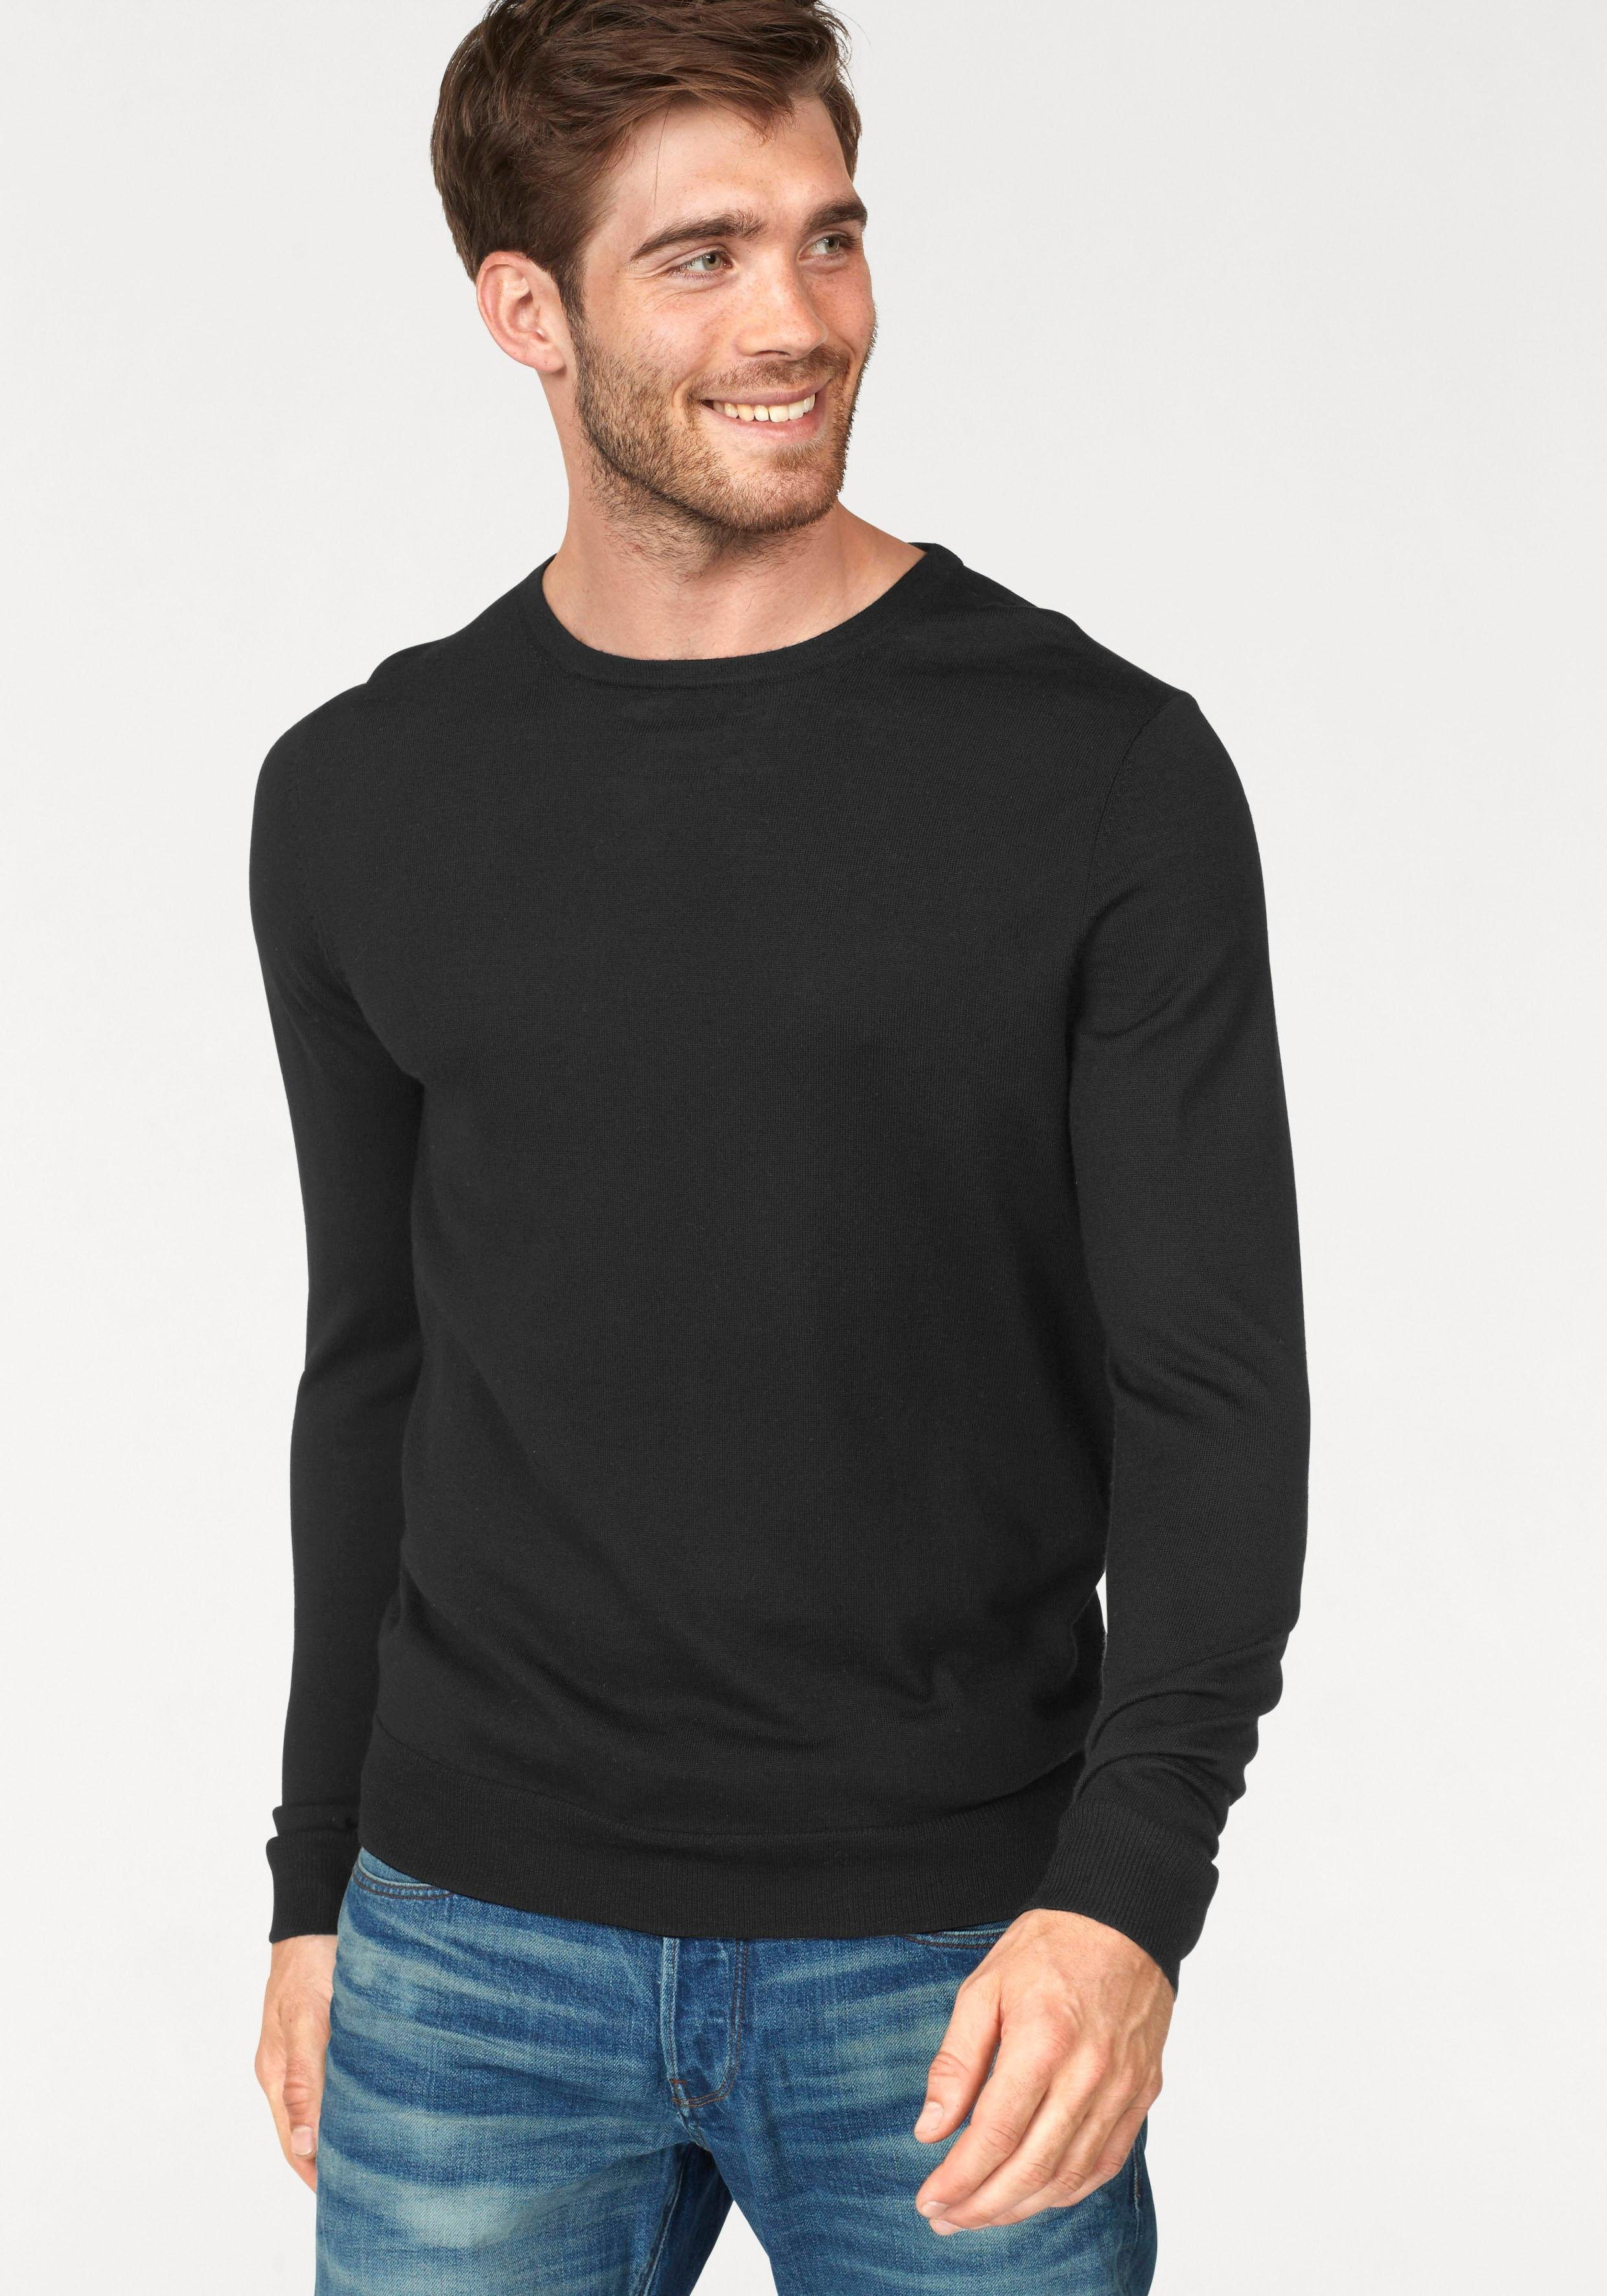 Jack & Jones Strickpullover »MARK KNIT CREW NECK« | Bekleidung > Pullover > Sonstige Pullover | Schwarz | Jack & Jones